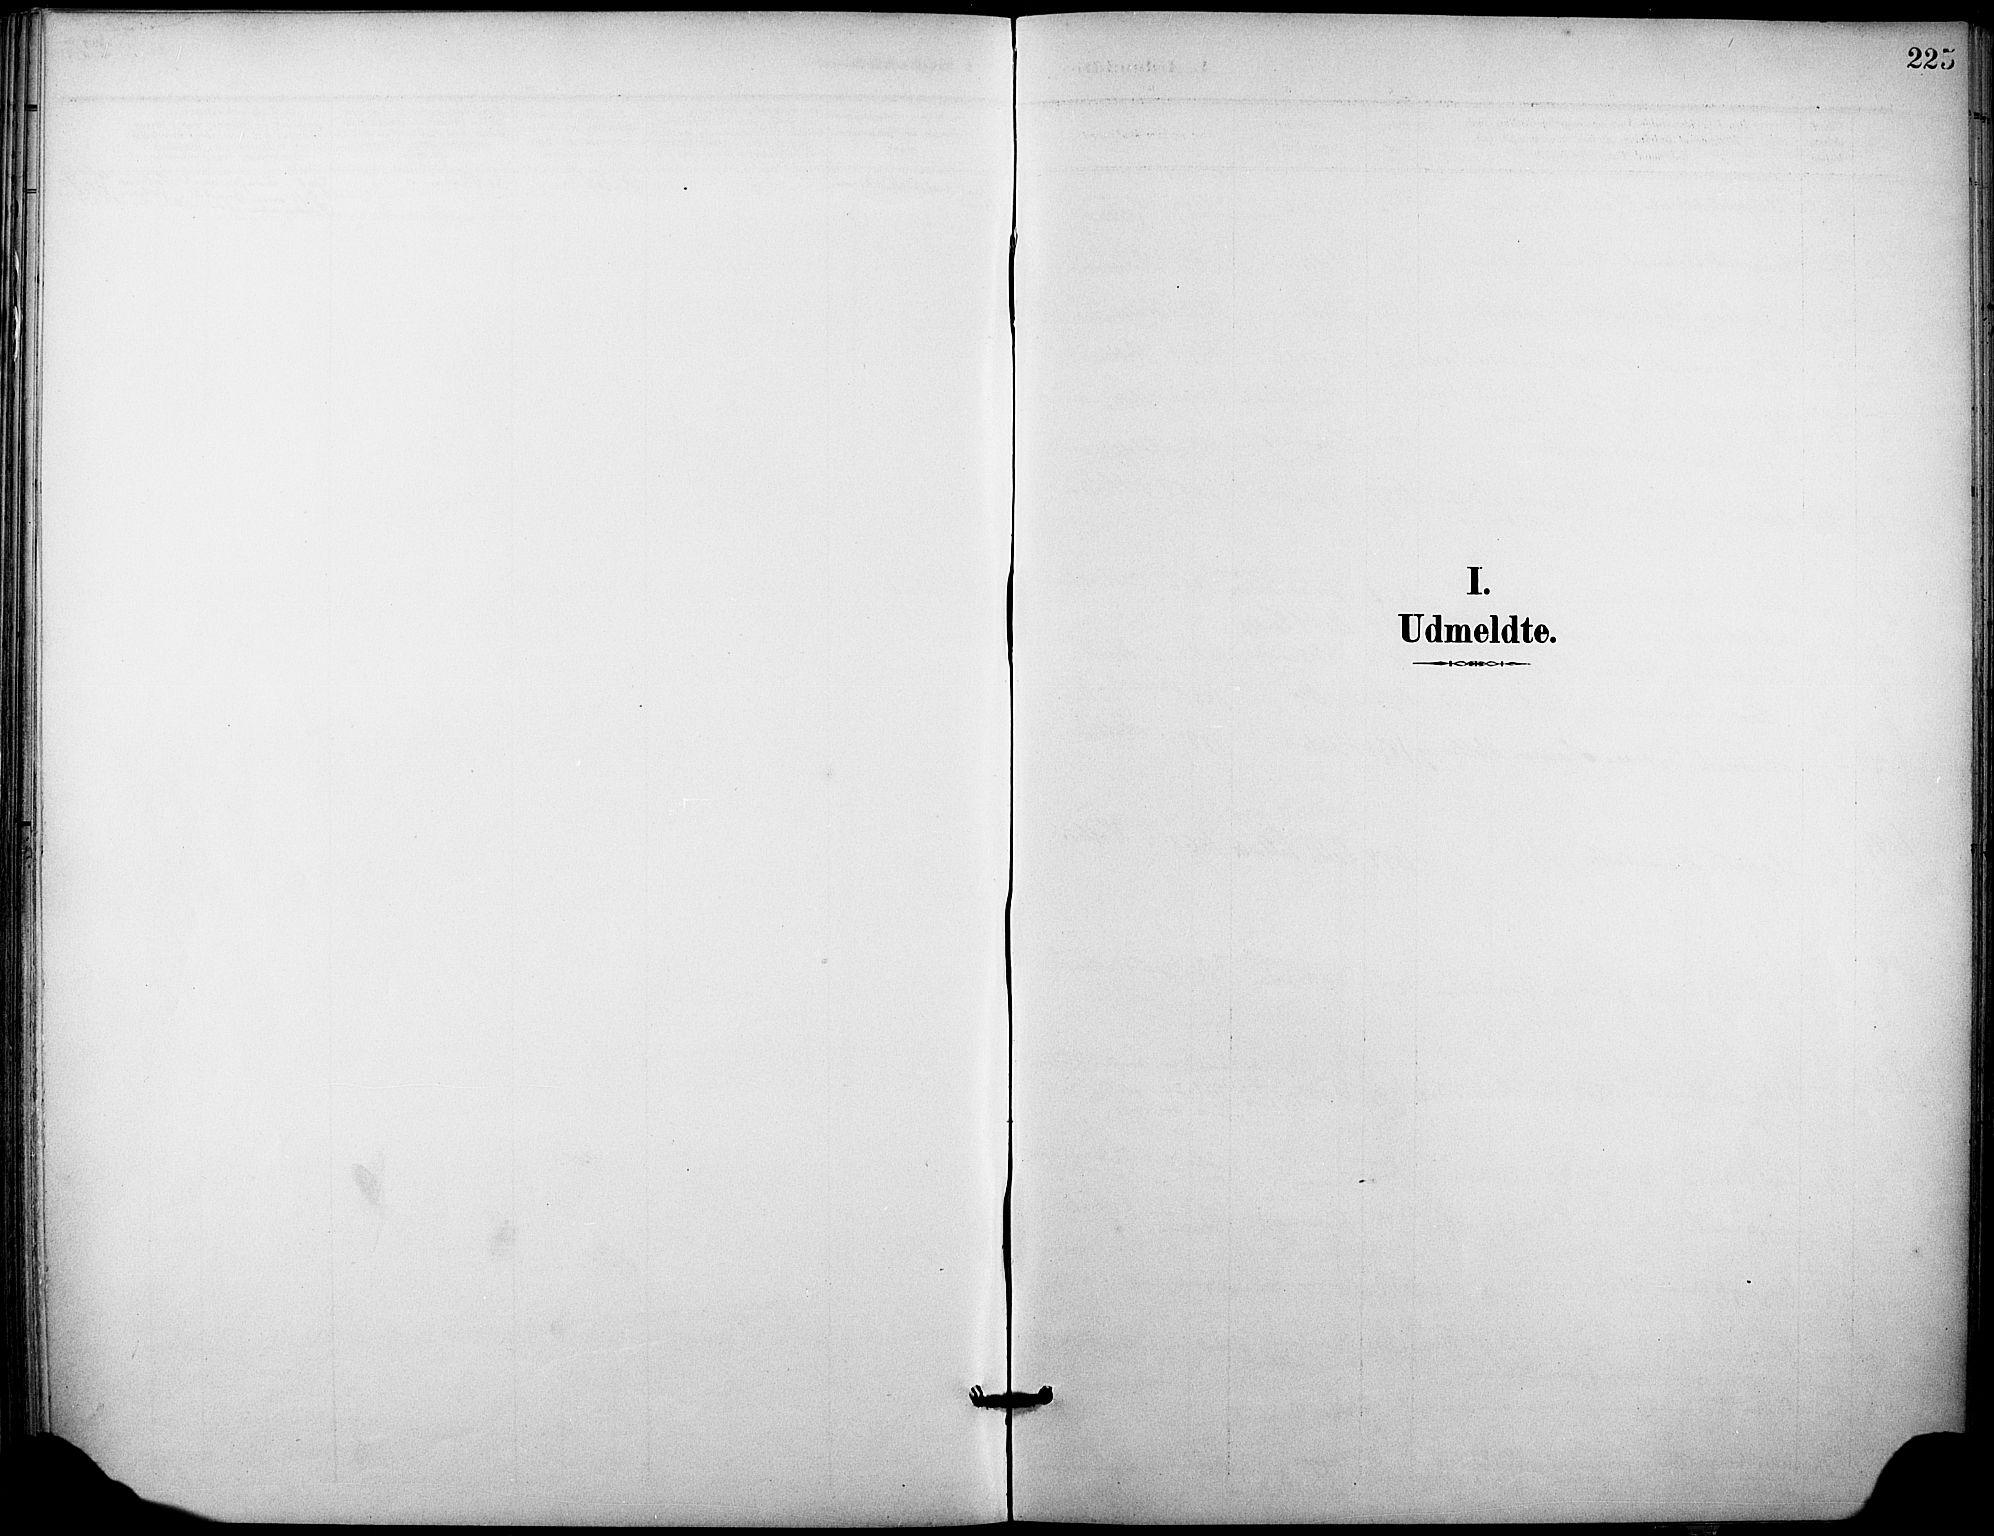 SAKO, Holla kirkebøker, F/Fa/L0010: Ministerialbok nr. 10, 1897-1907, s. 225